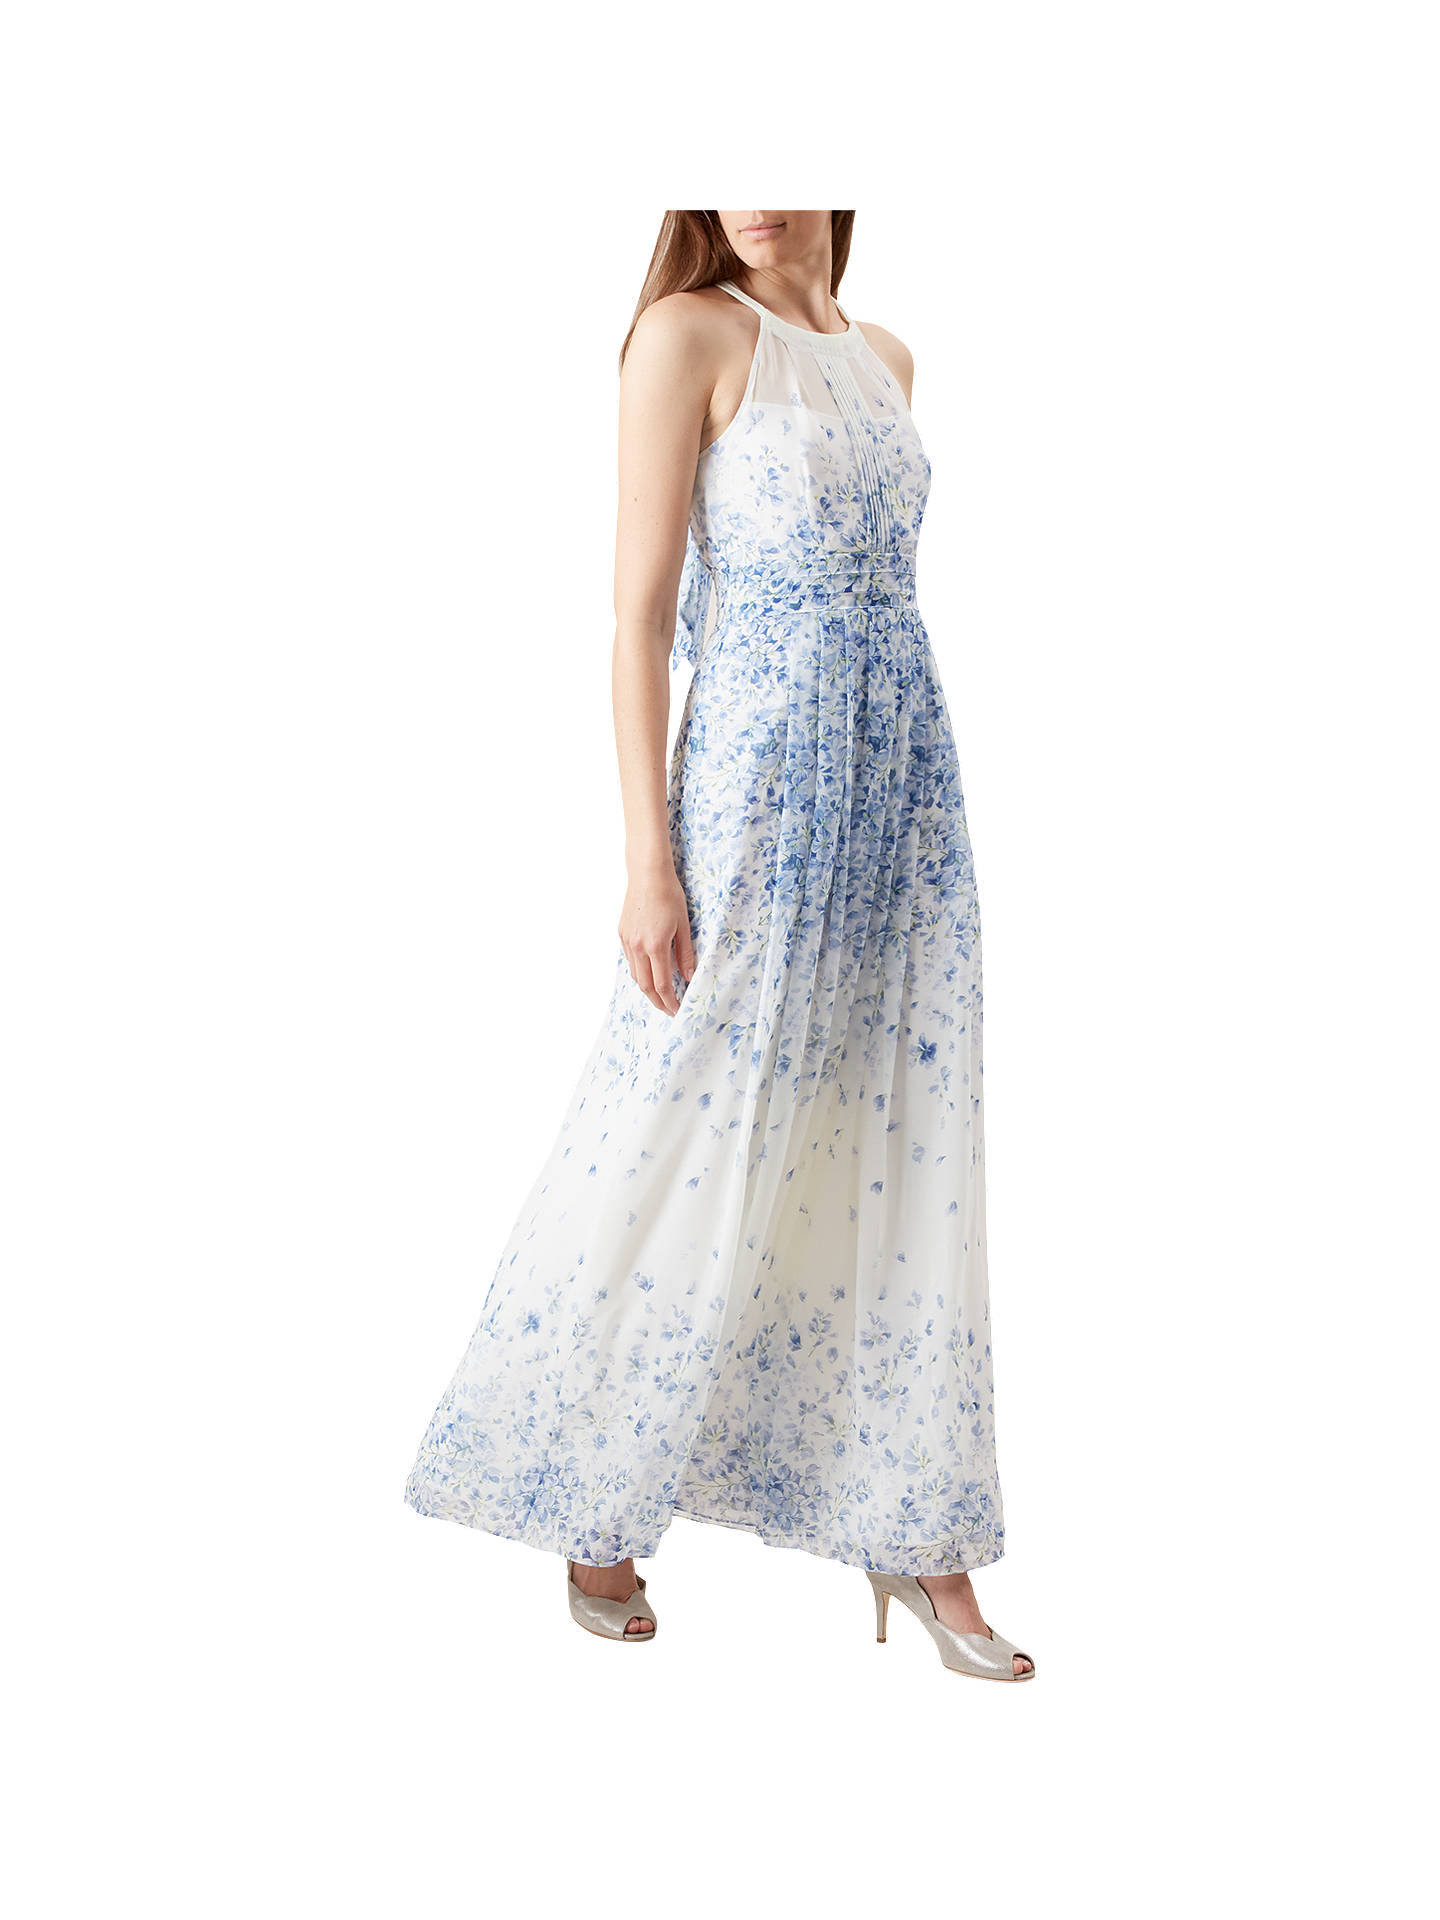 cd568001f33 Buy Hobbs Alexis Maxi Dress